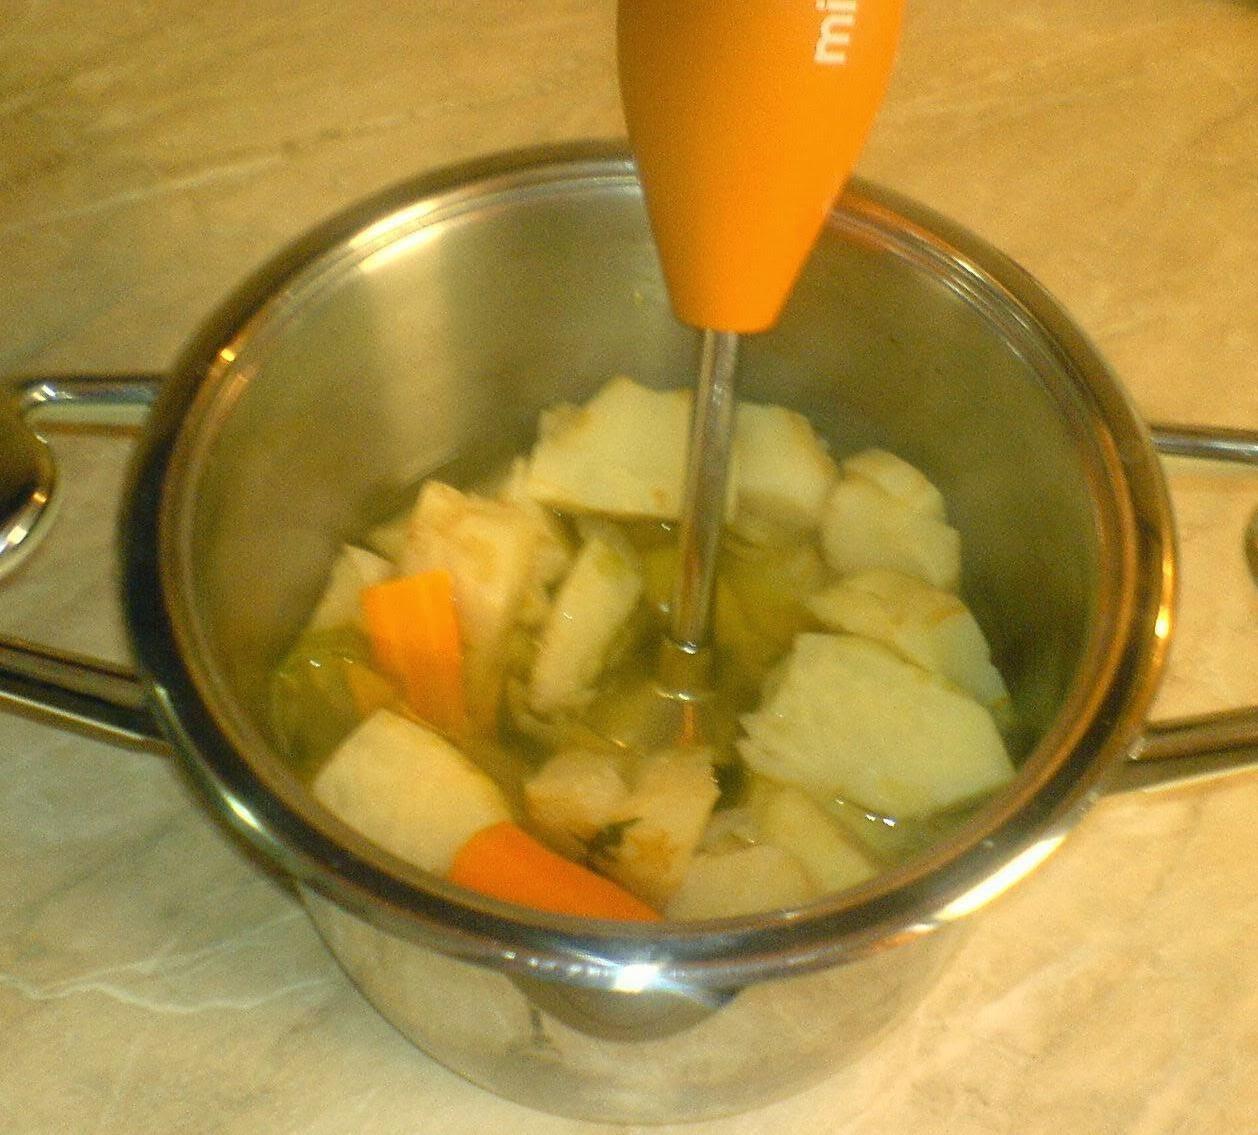 retete de post, retete de mancare, supa crema de telina, retete culinare, preparate culinare, retete dietetice, diete de slabit, cura de slabire, macaruri de post, retete cu legume, supa crema de legume, retete afrodisiace, retete supe creme, supe, supe creme, retete supe creme de legume, crema de telina, crema de legume,